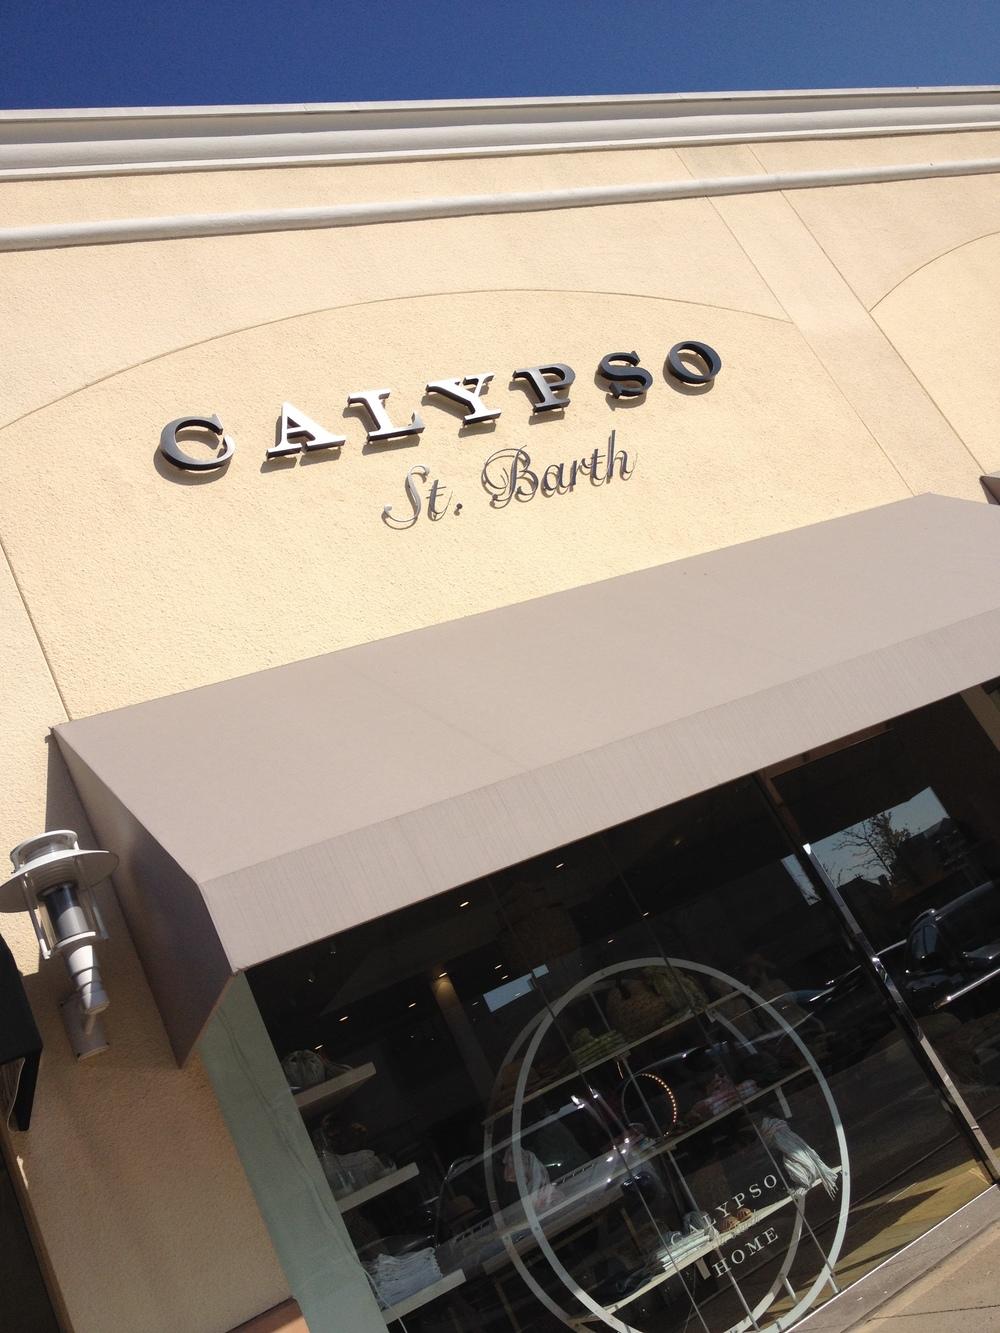 calypos.jpg